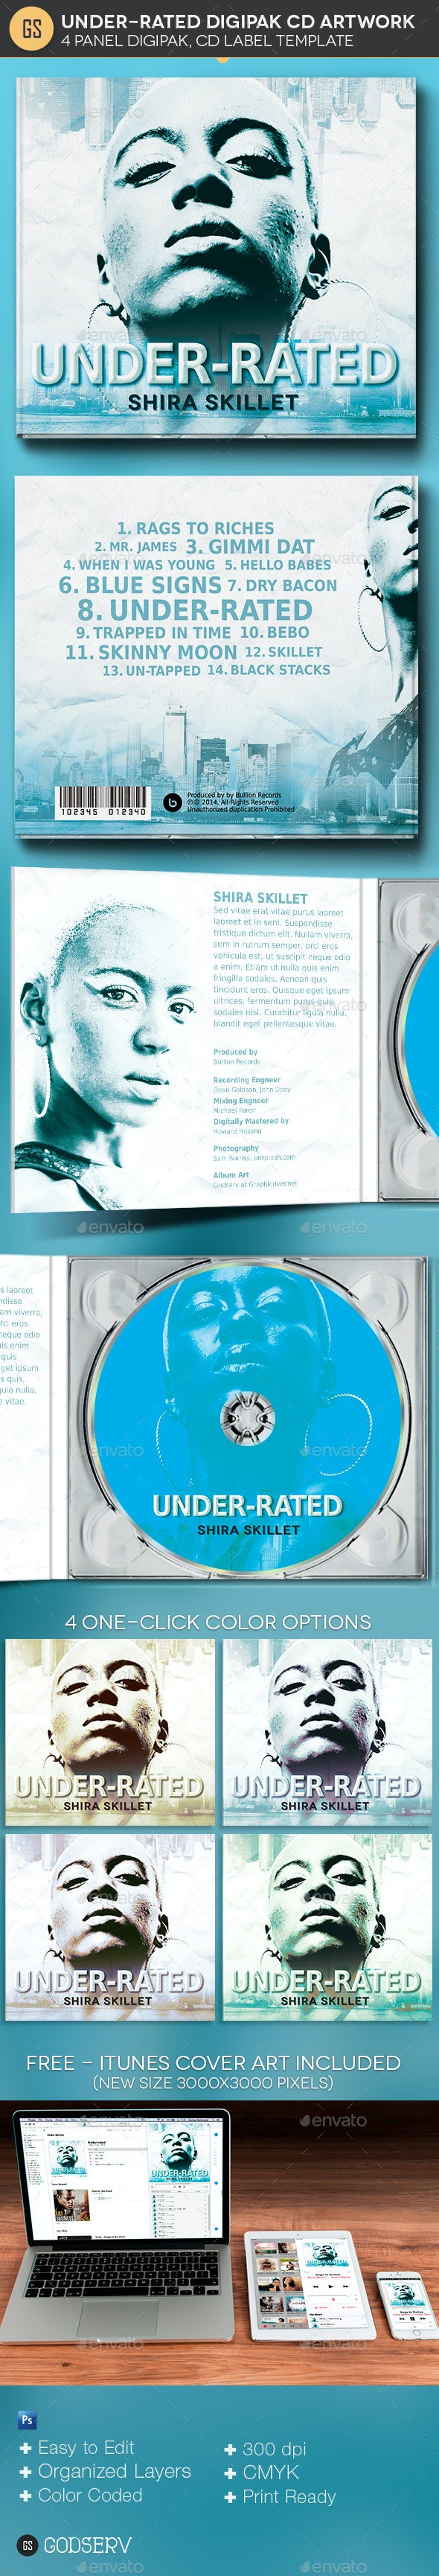 Underrated 4 Panel Digipak CD Artwork Template - CD & DVD Artwork Print Templates